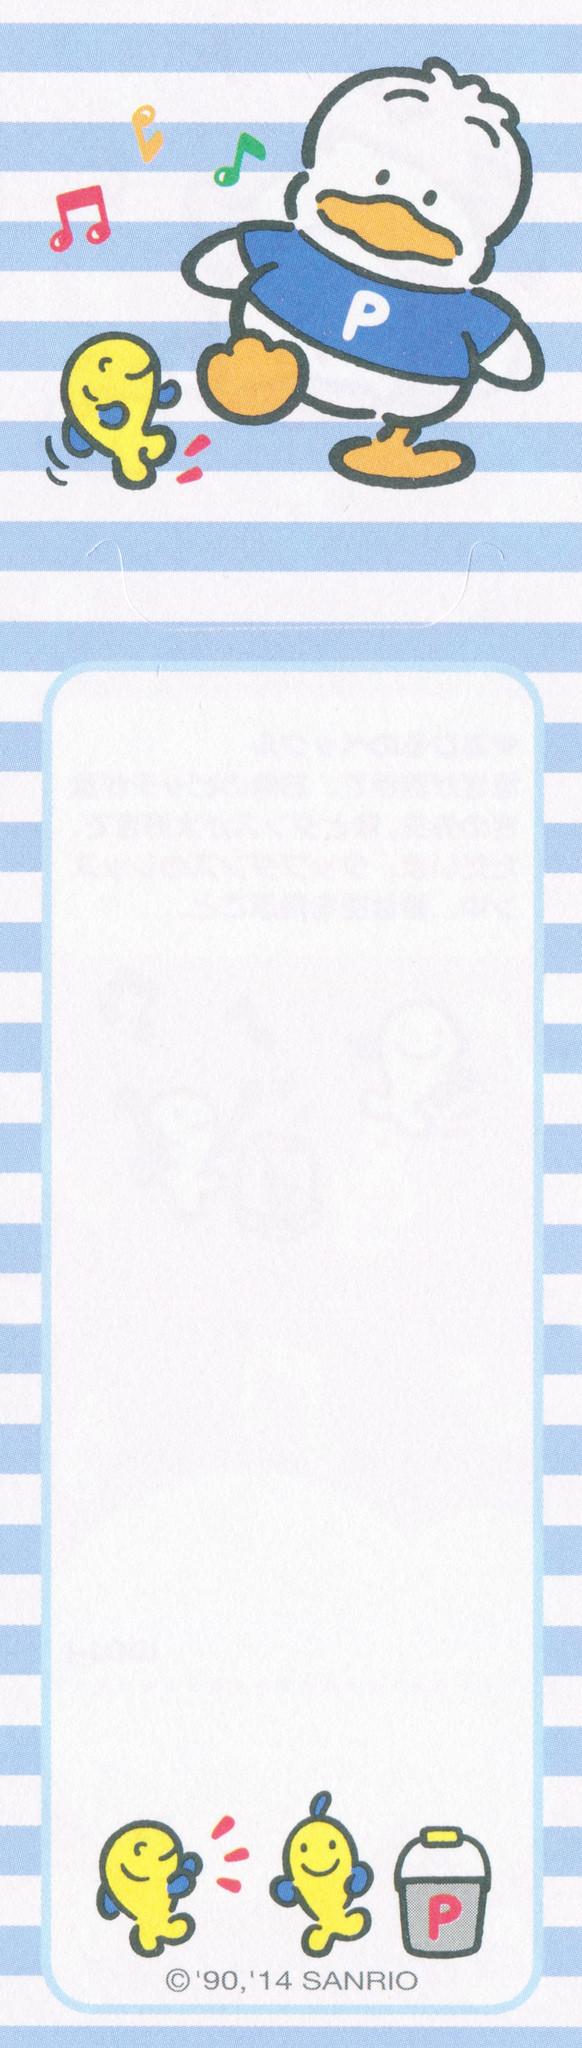 flic kr p rfwbb sanrio characters memo marques flic kr p r6fwbb sanrio 100 characters memo